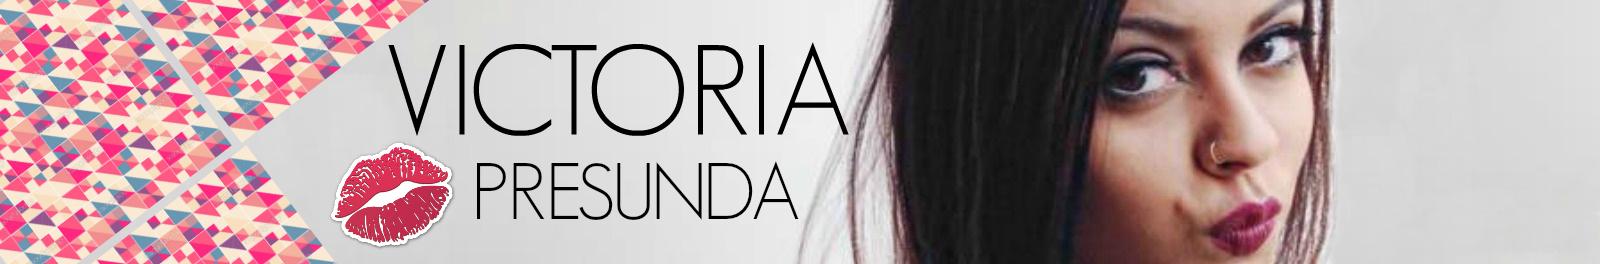 Blog da Victoria Presunda